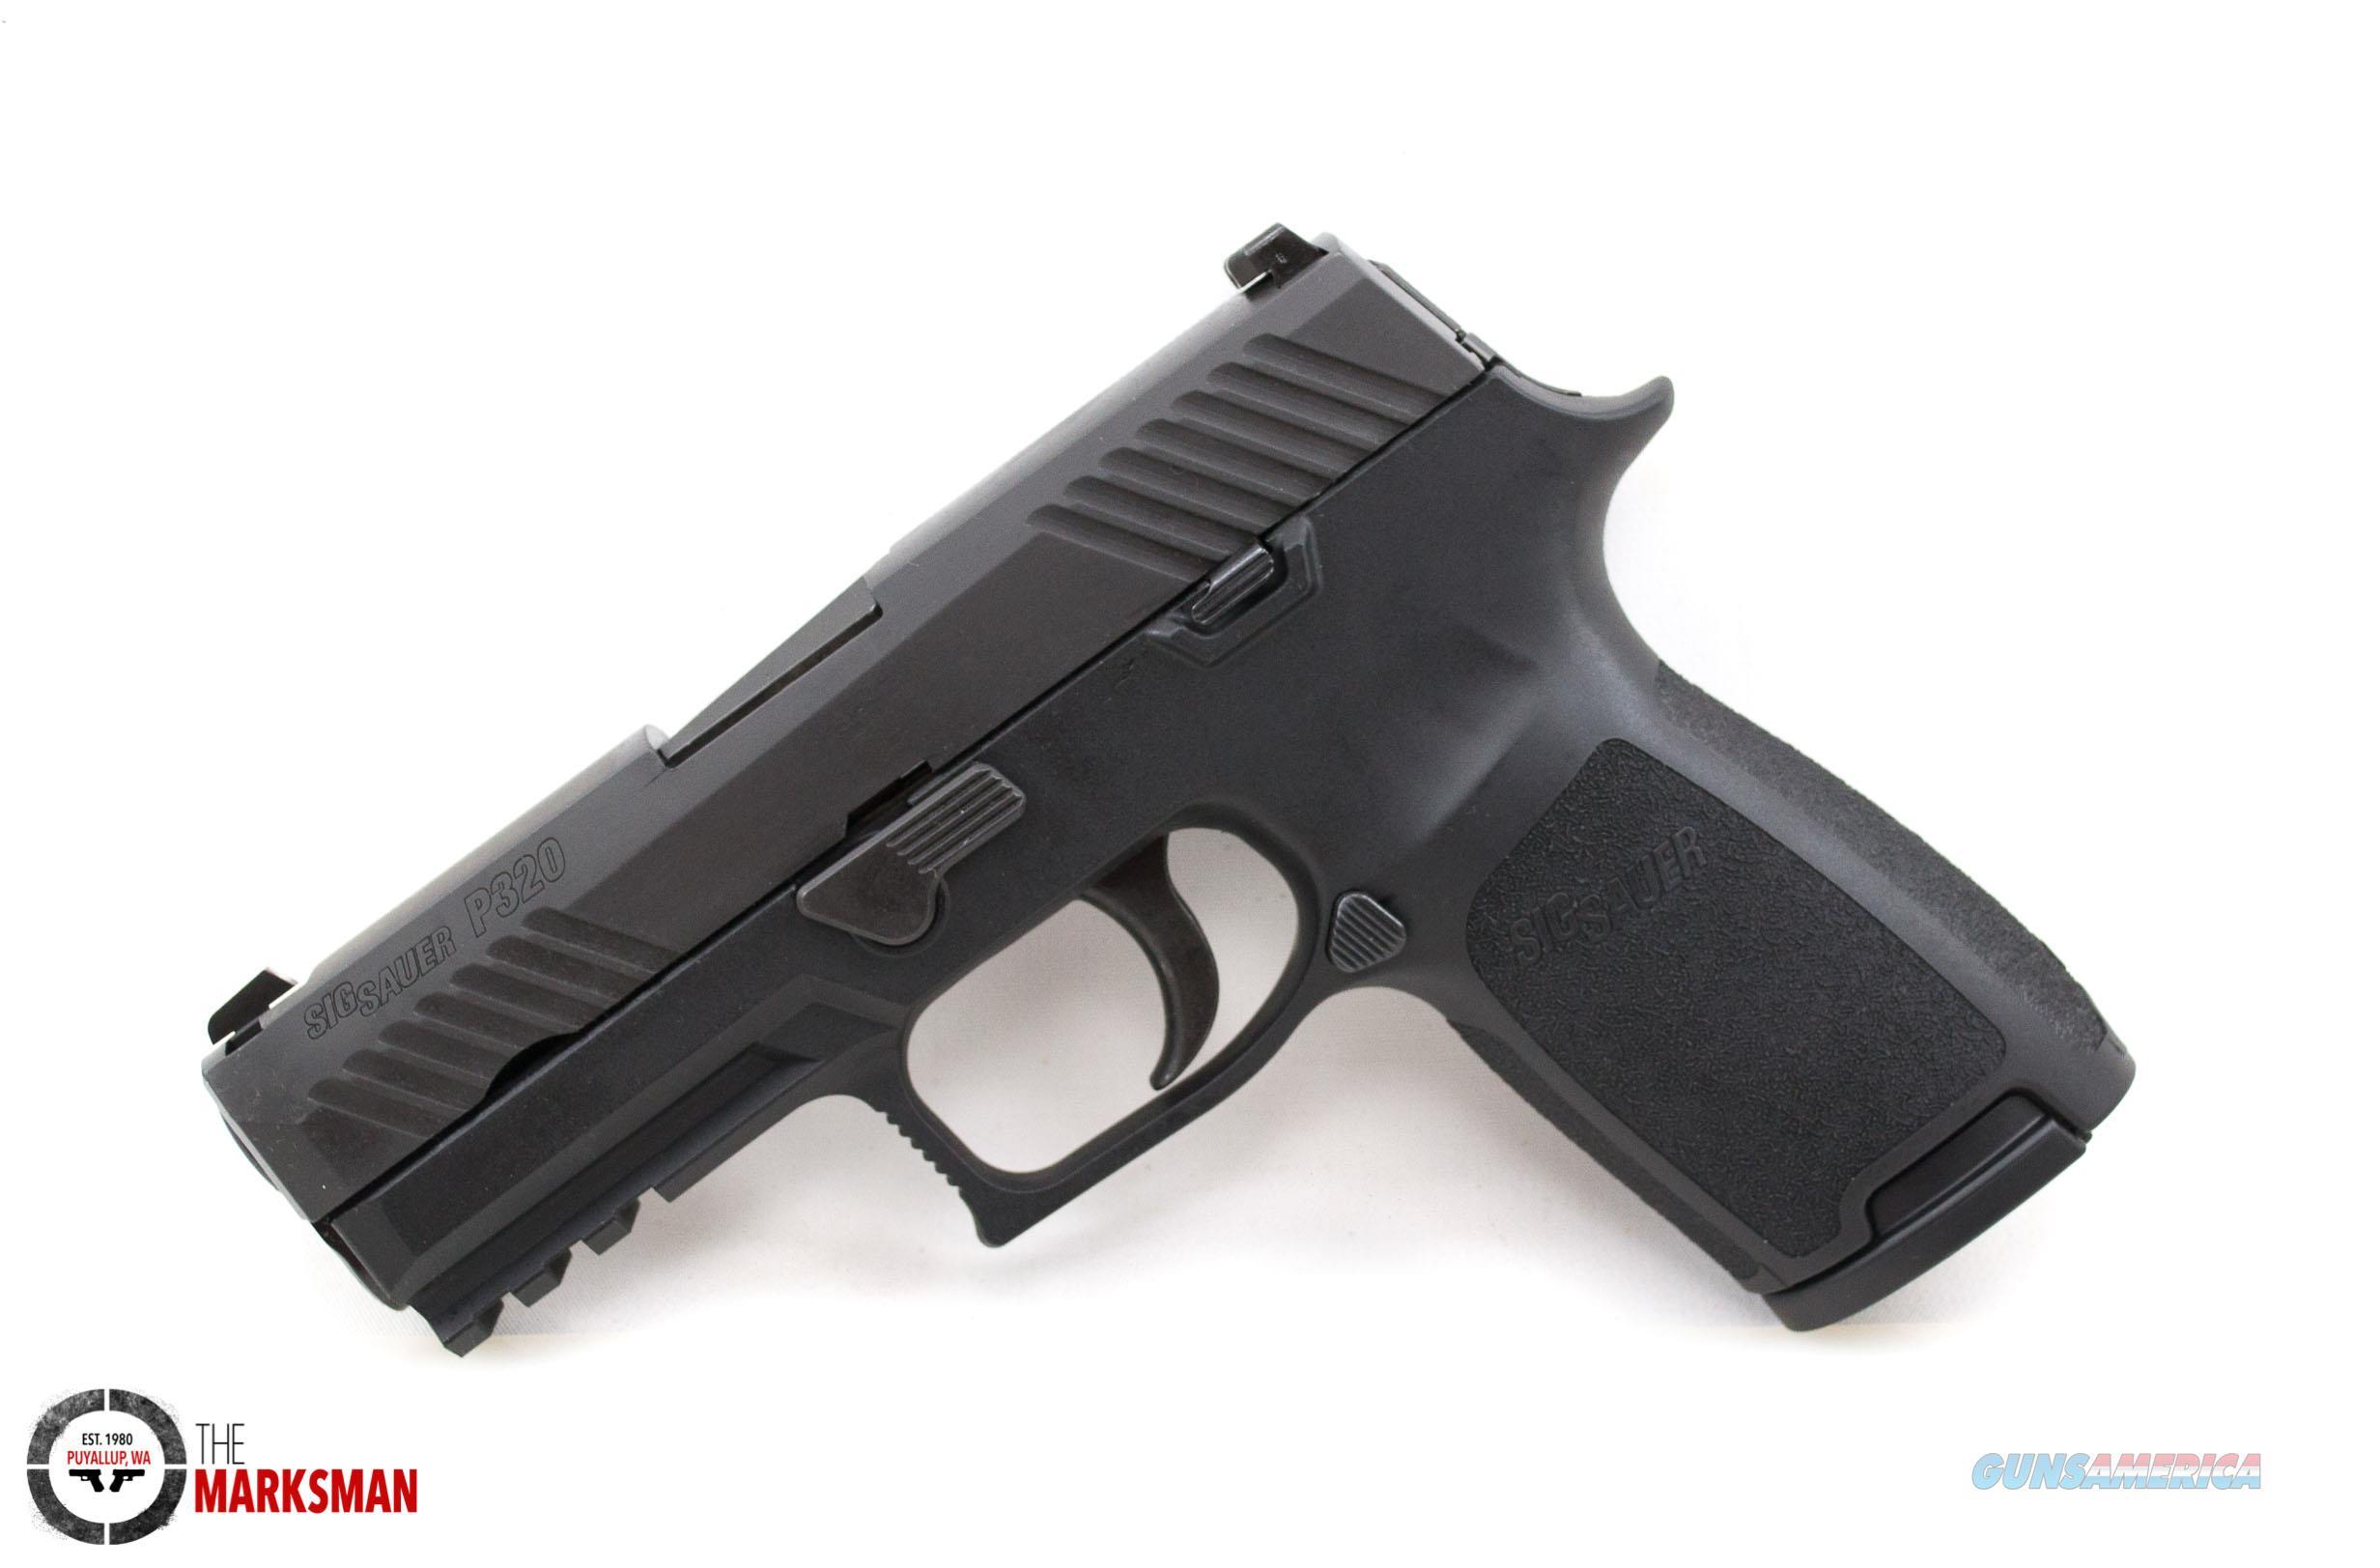 Sig Sauer P320 Carry, .45 ACP, Night Sights NEW  Guns > Pistols > Sig - Sauer/Sigarms Pistols > P320